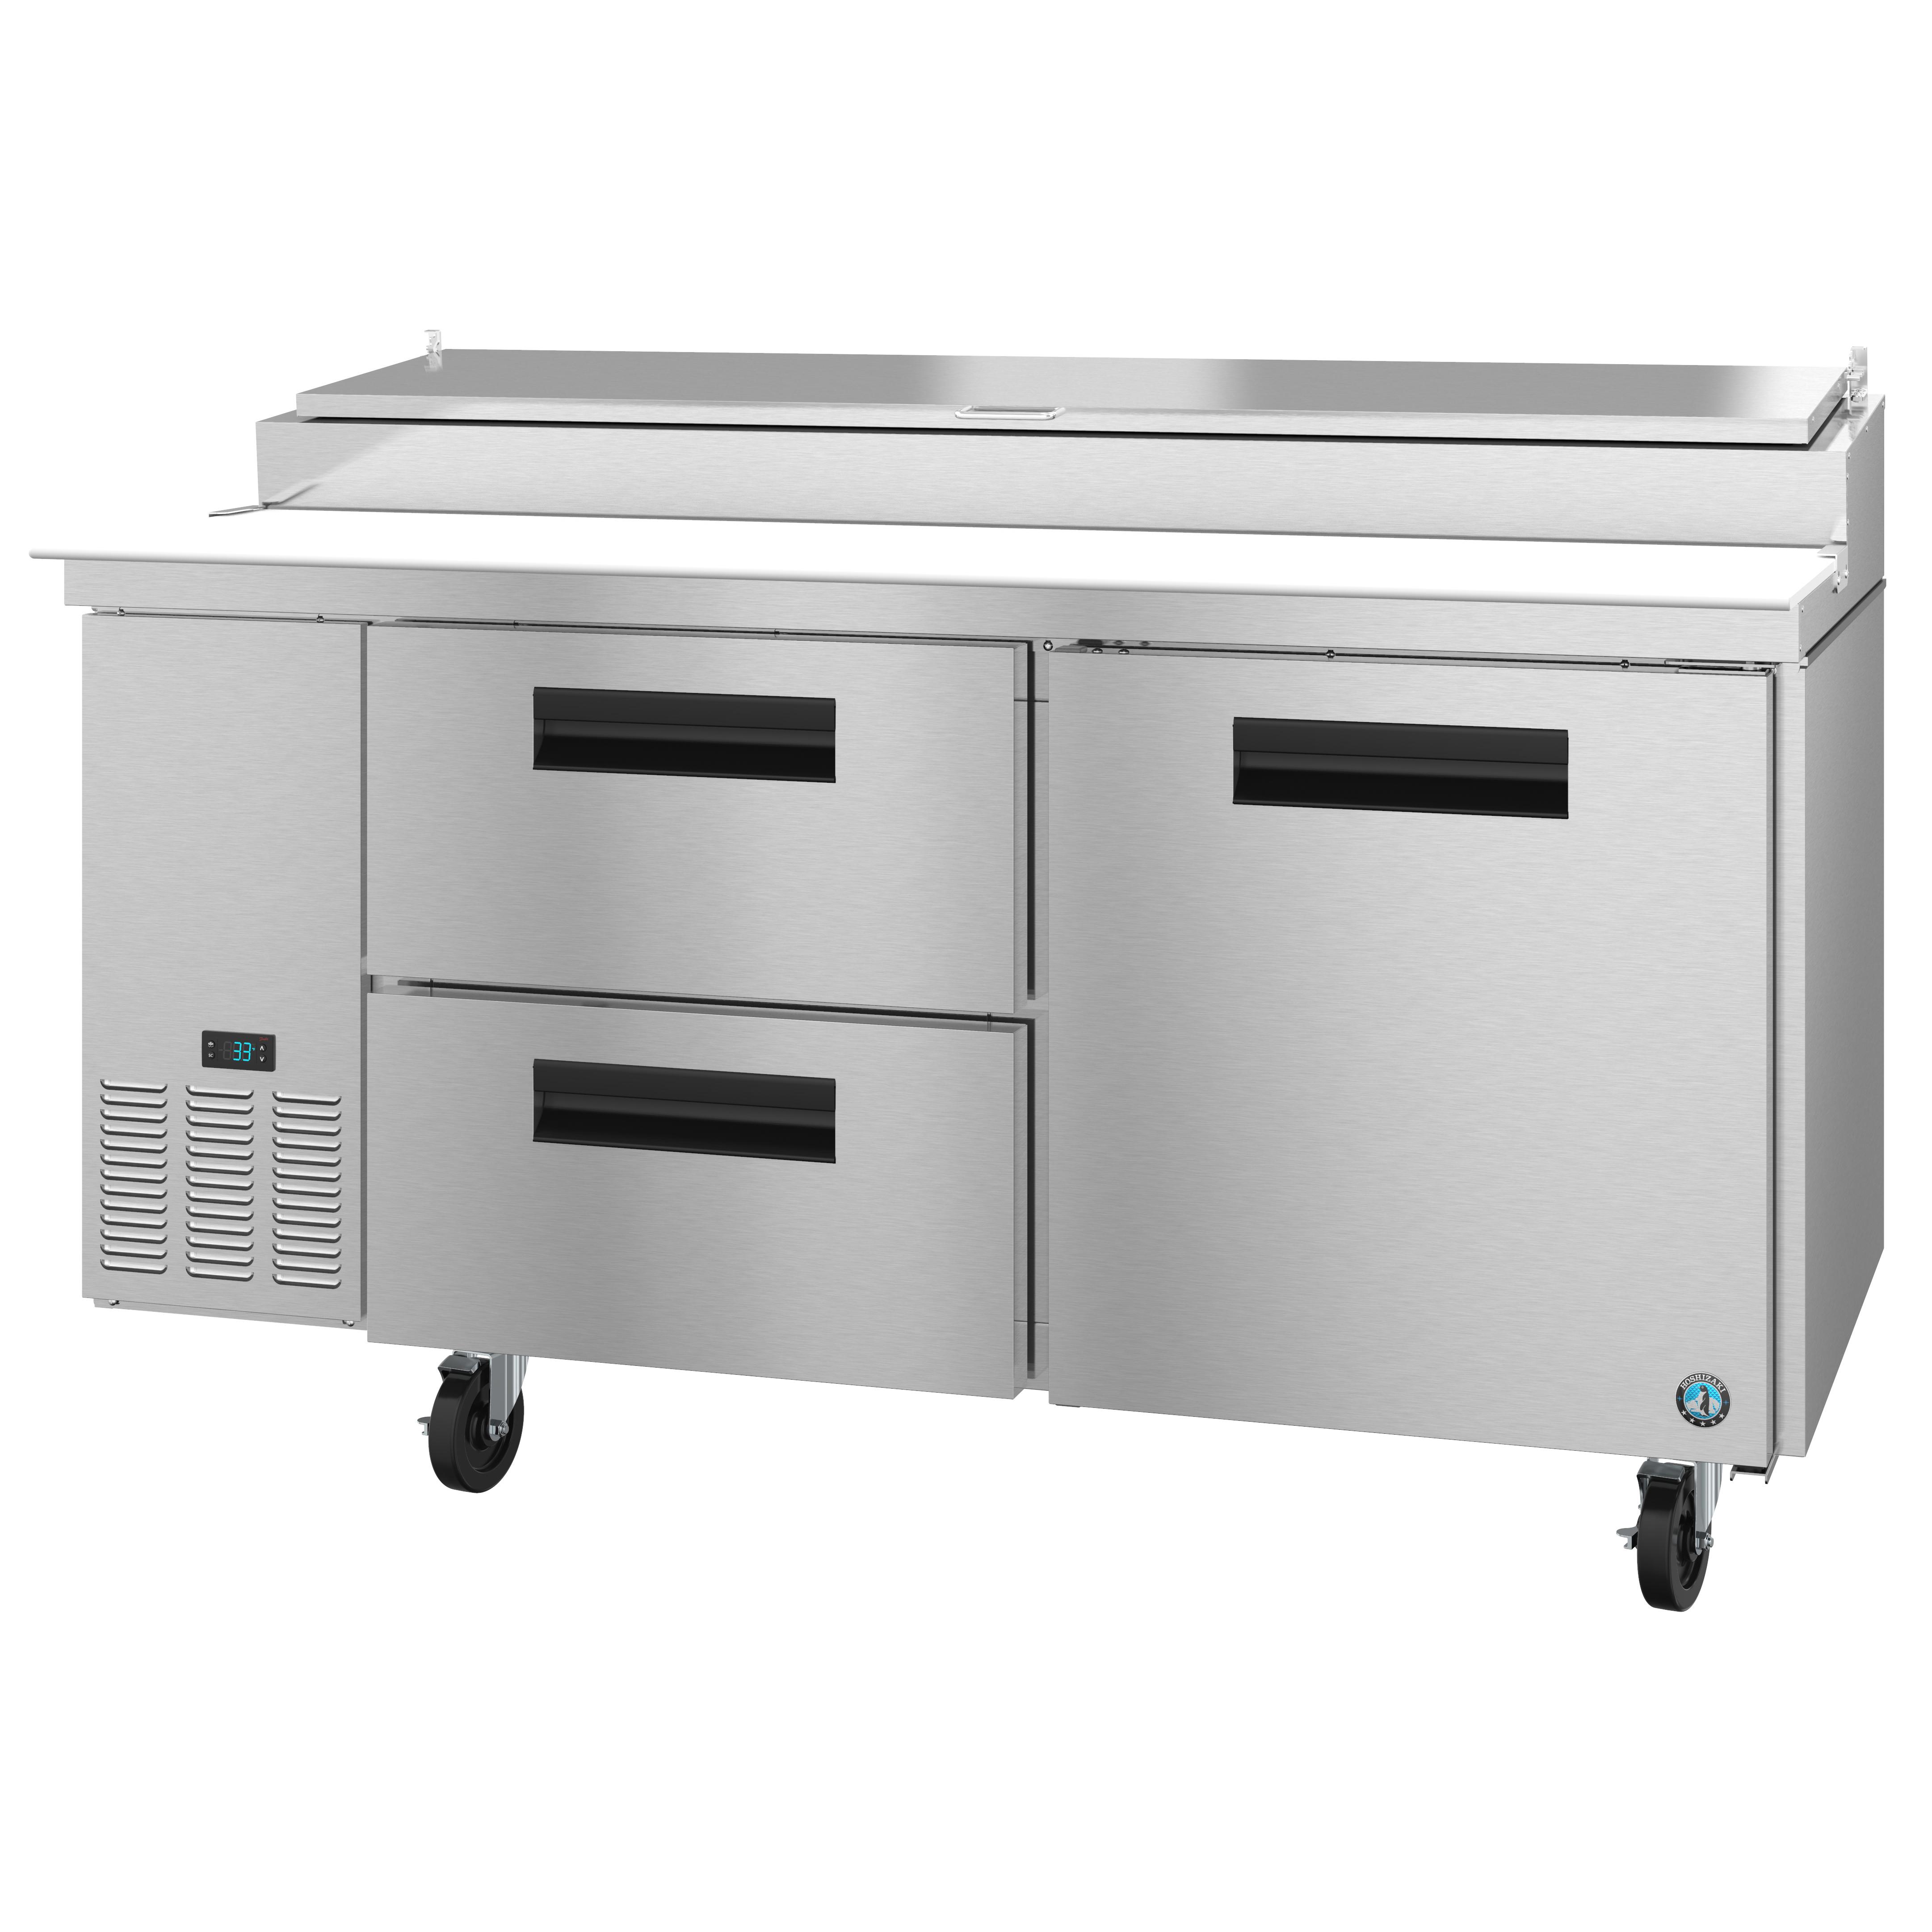 Hoshizaki PR67A-D2 refrigerated counter, pizza prep table